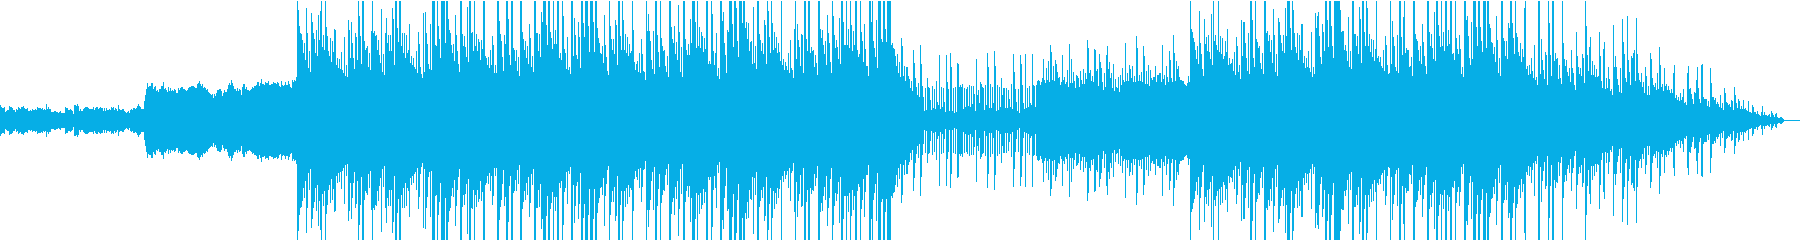 808's、ヒップホップ、トラップビートの再生済みの波形